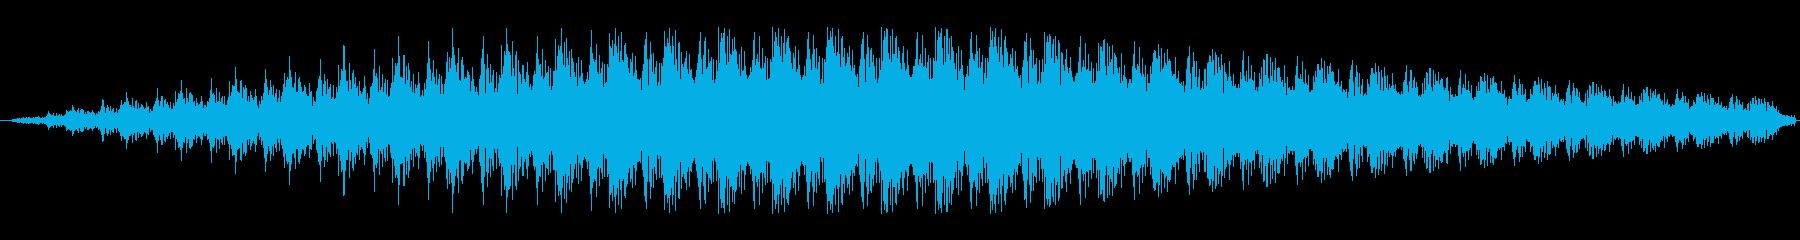 ファンファンファンの再生済みの波形